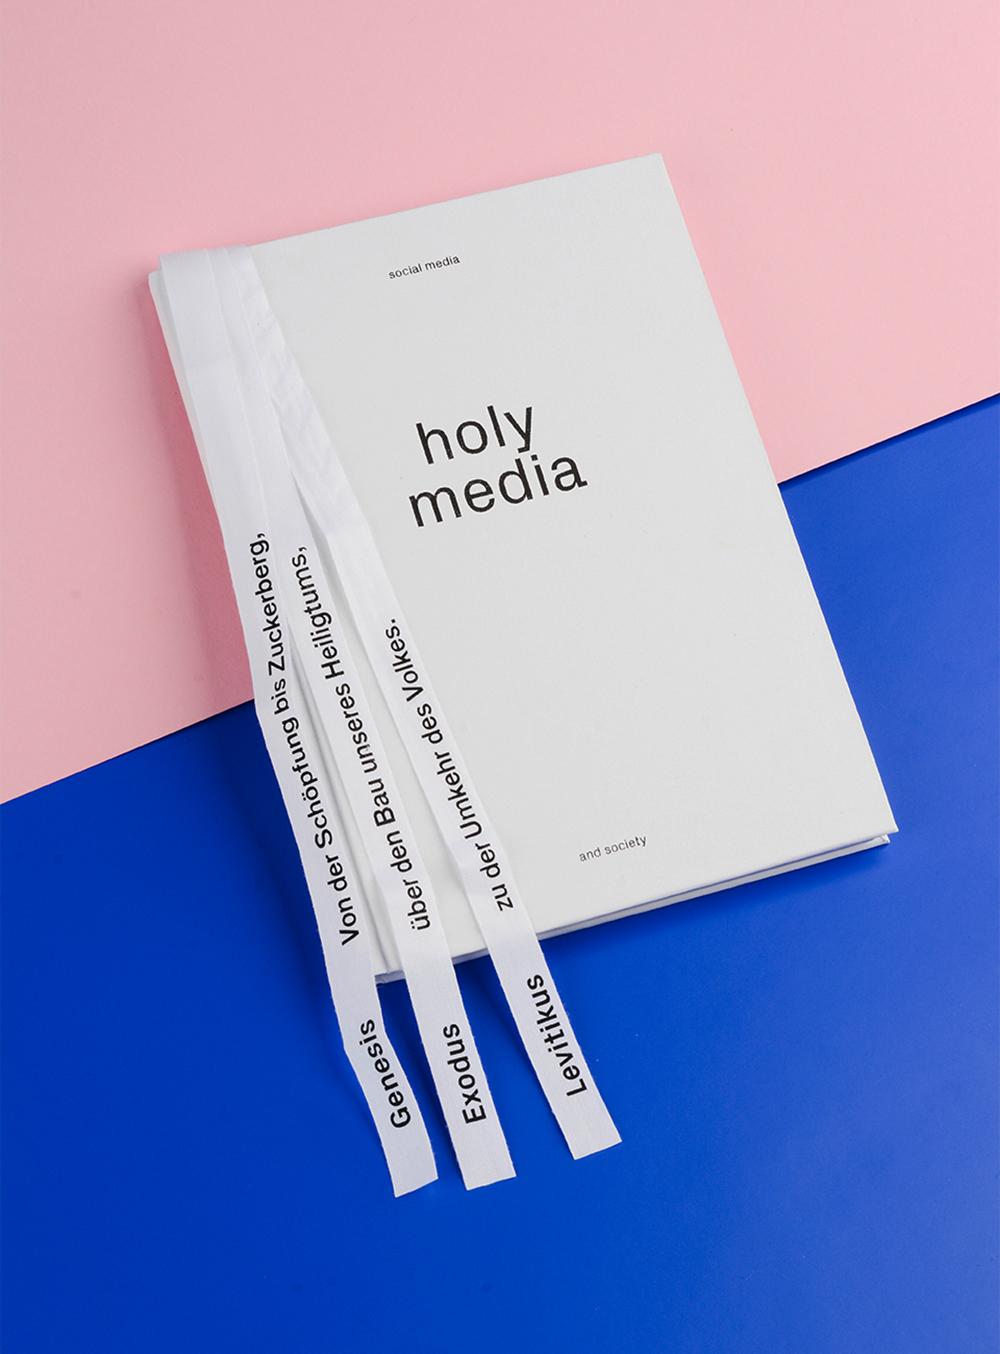 Holymedia_2